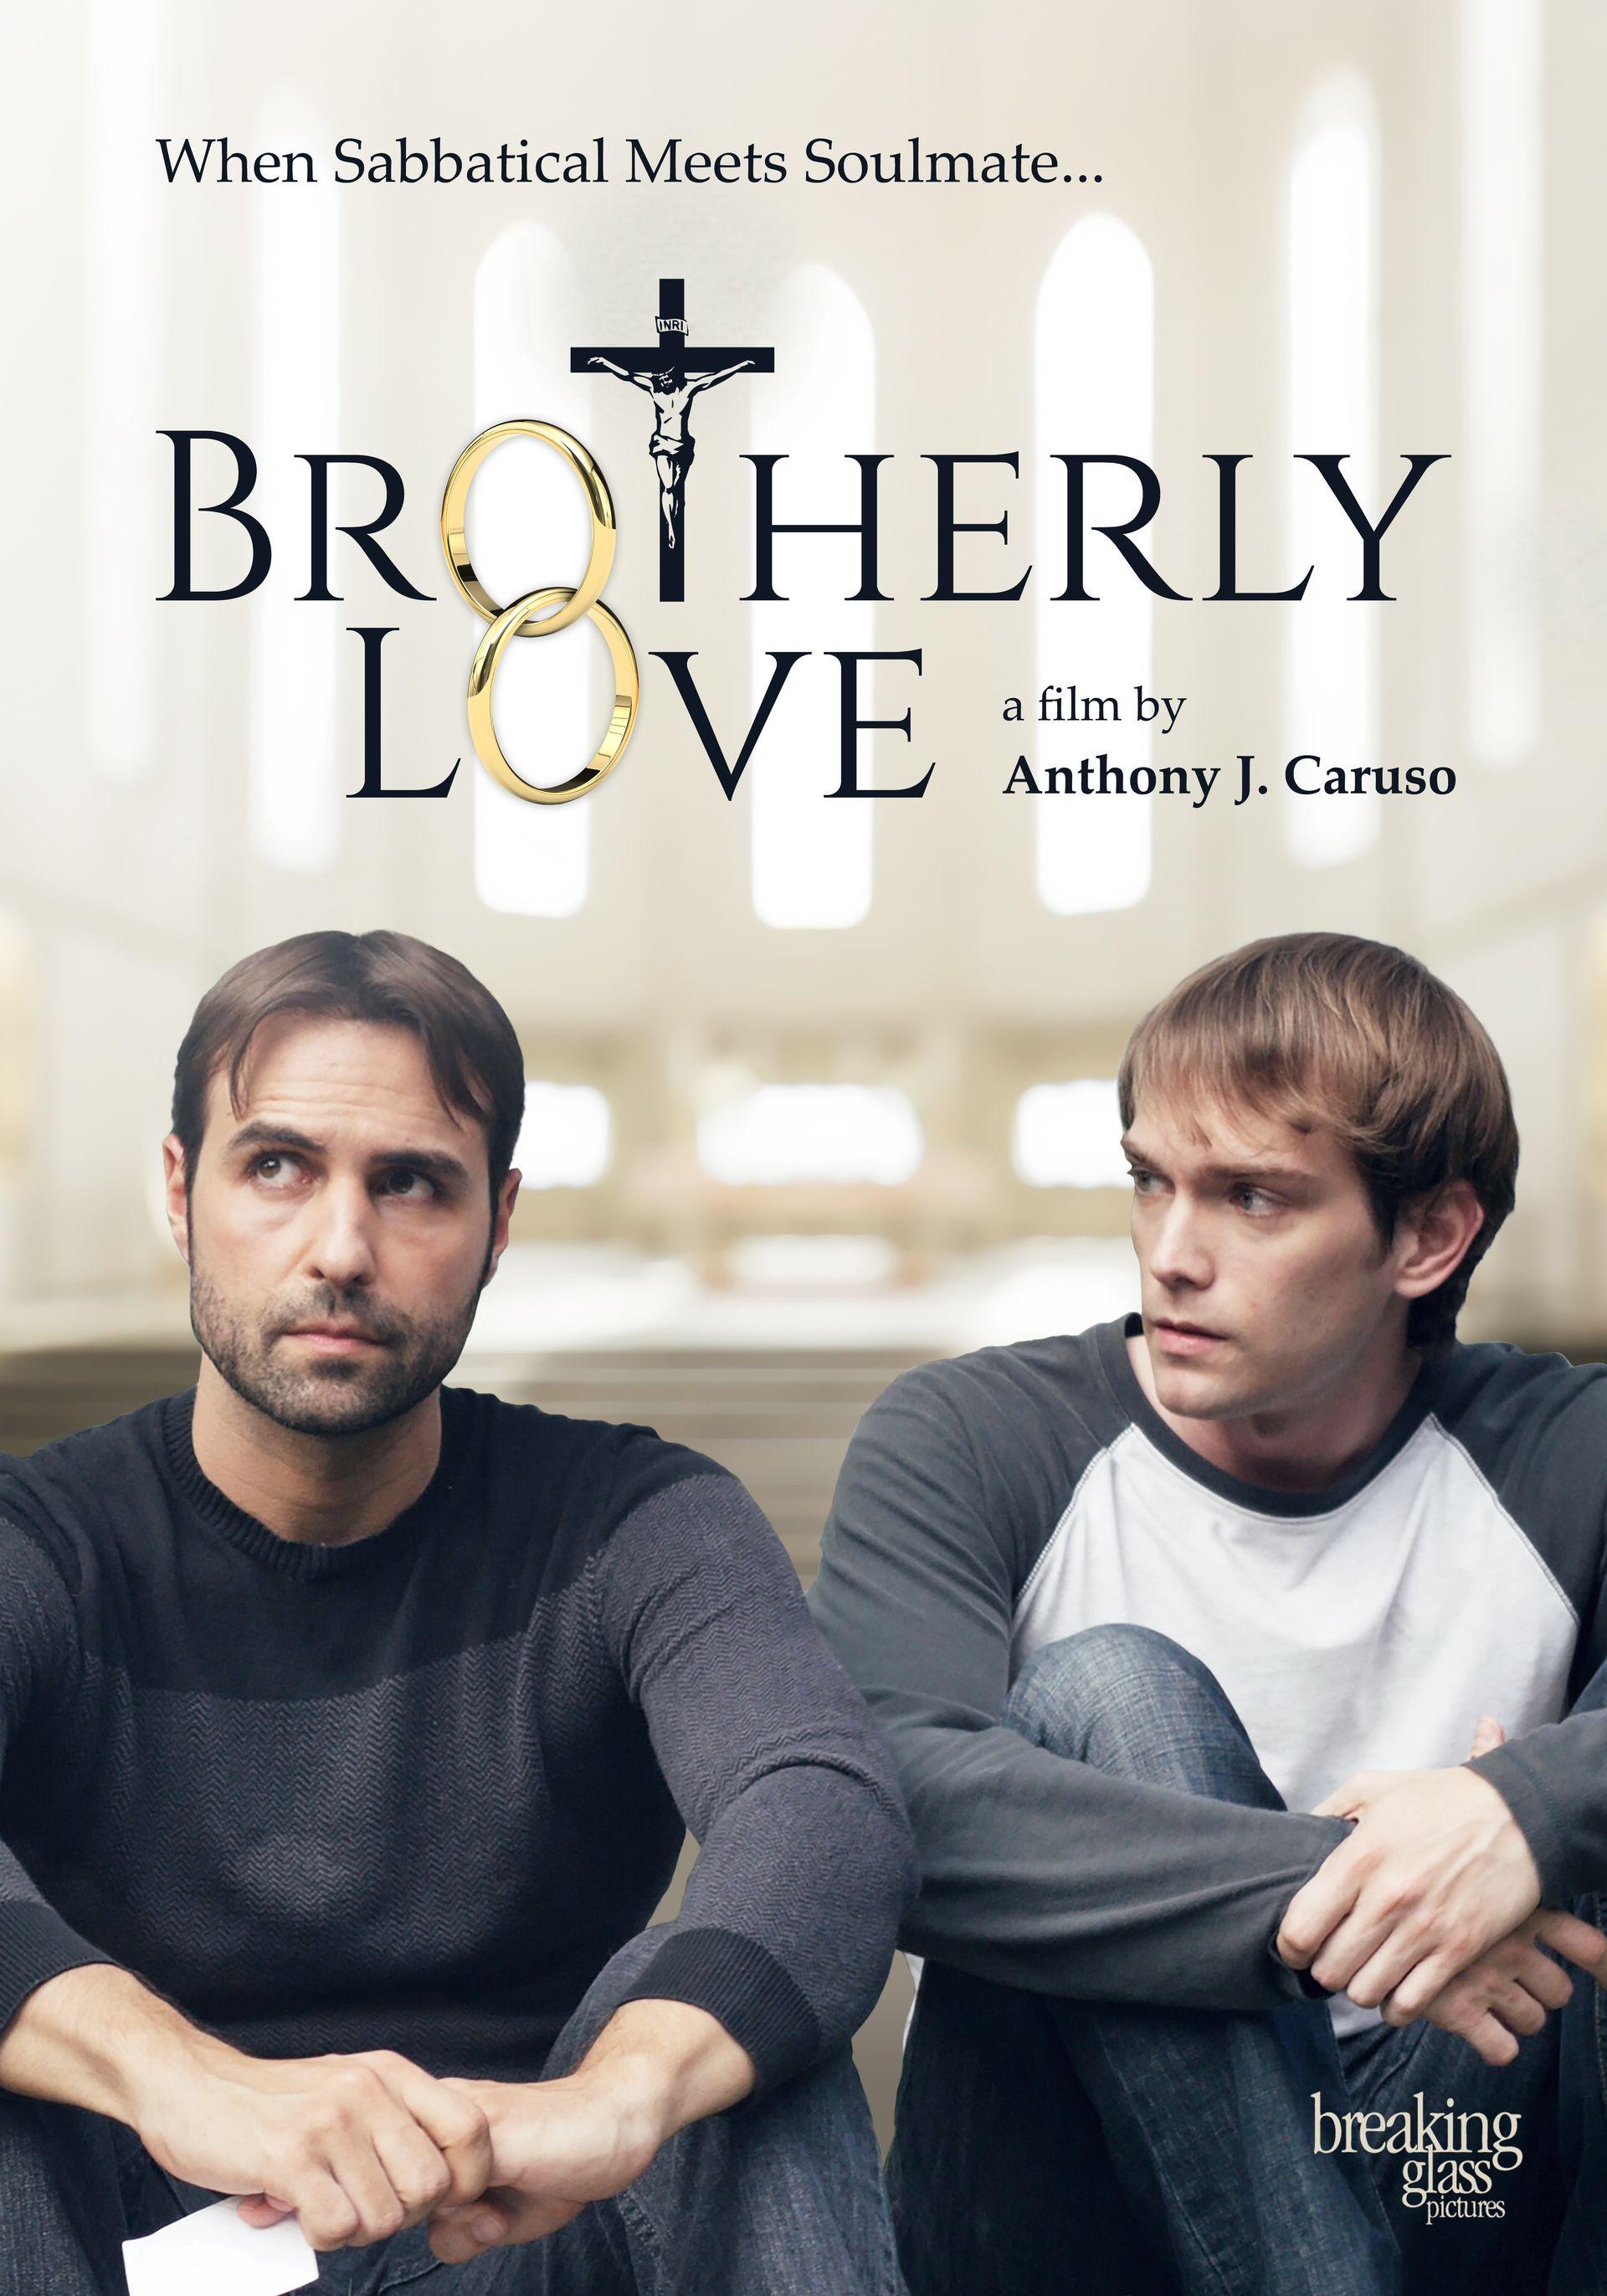 Amor En Fin Movie Online brotherly love | brotherly love, love movie, movie covers